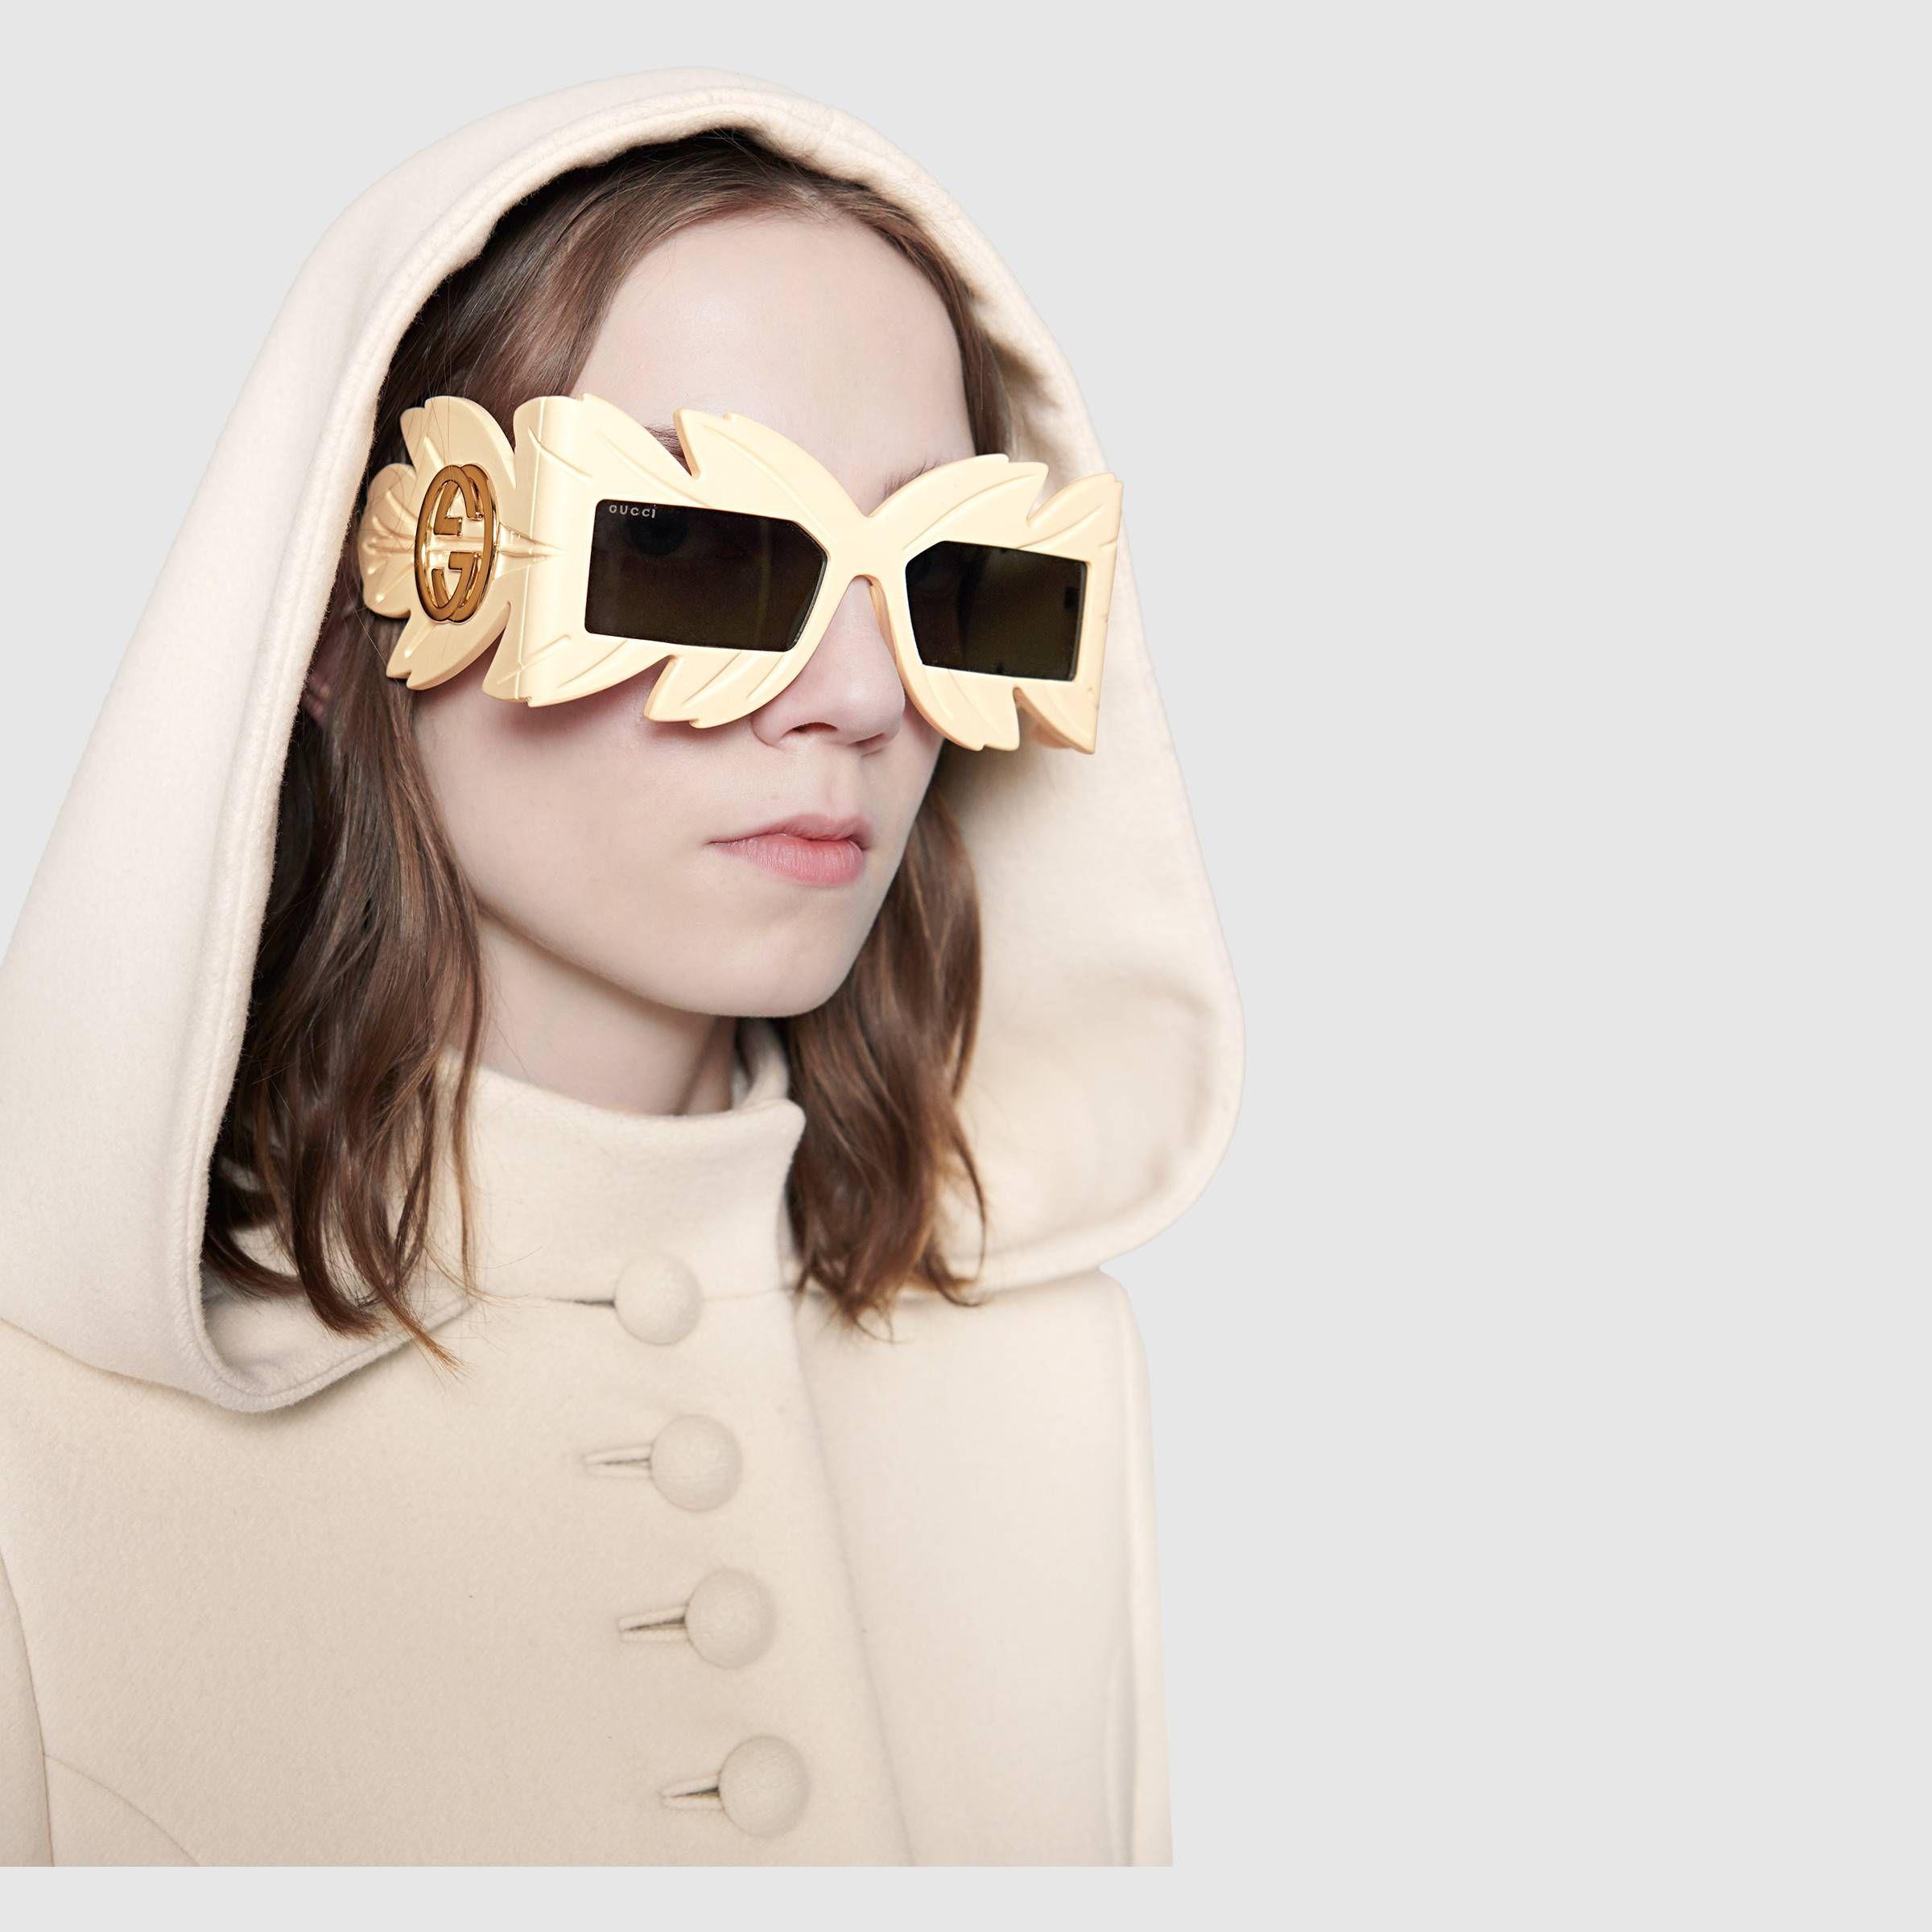 458590de58 Mask-frame acetate sunglasses - Gucci Women s Square   Rectangular  543939J07409211